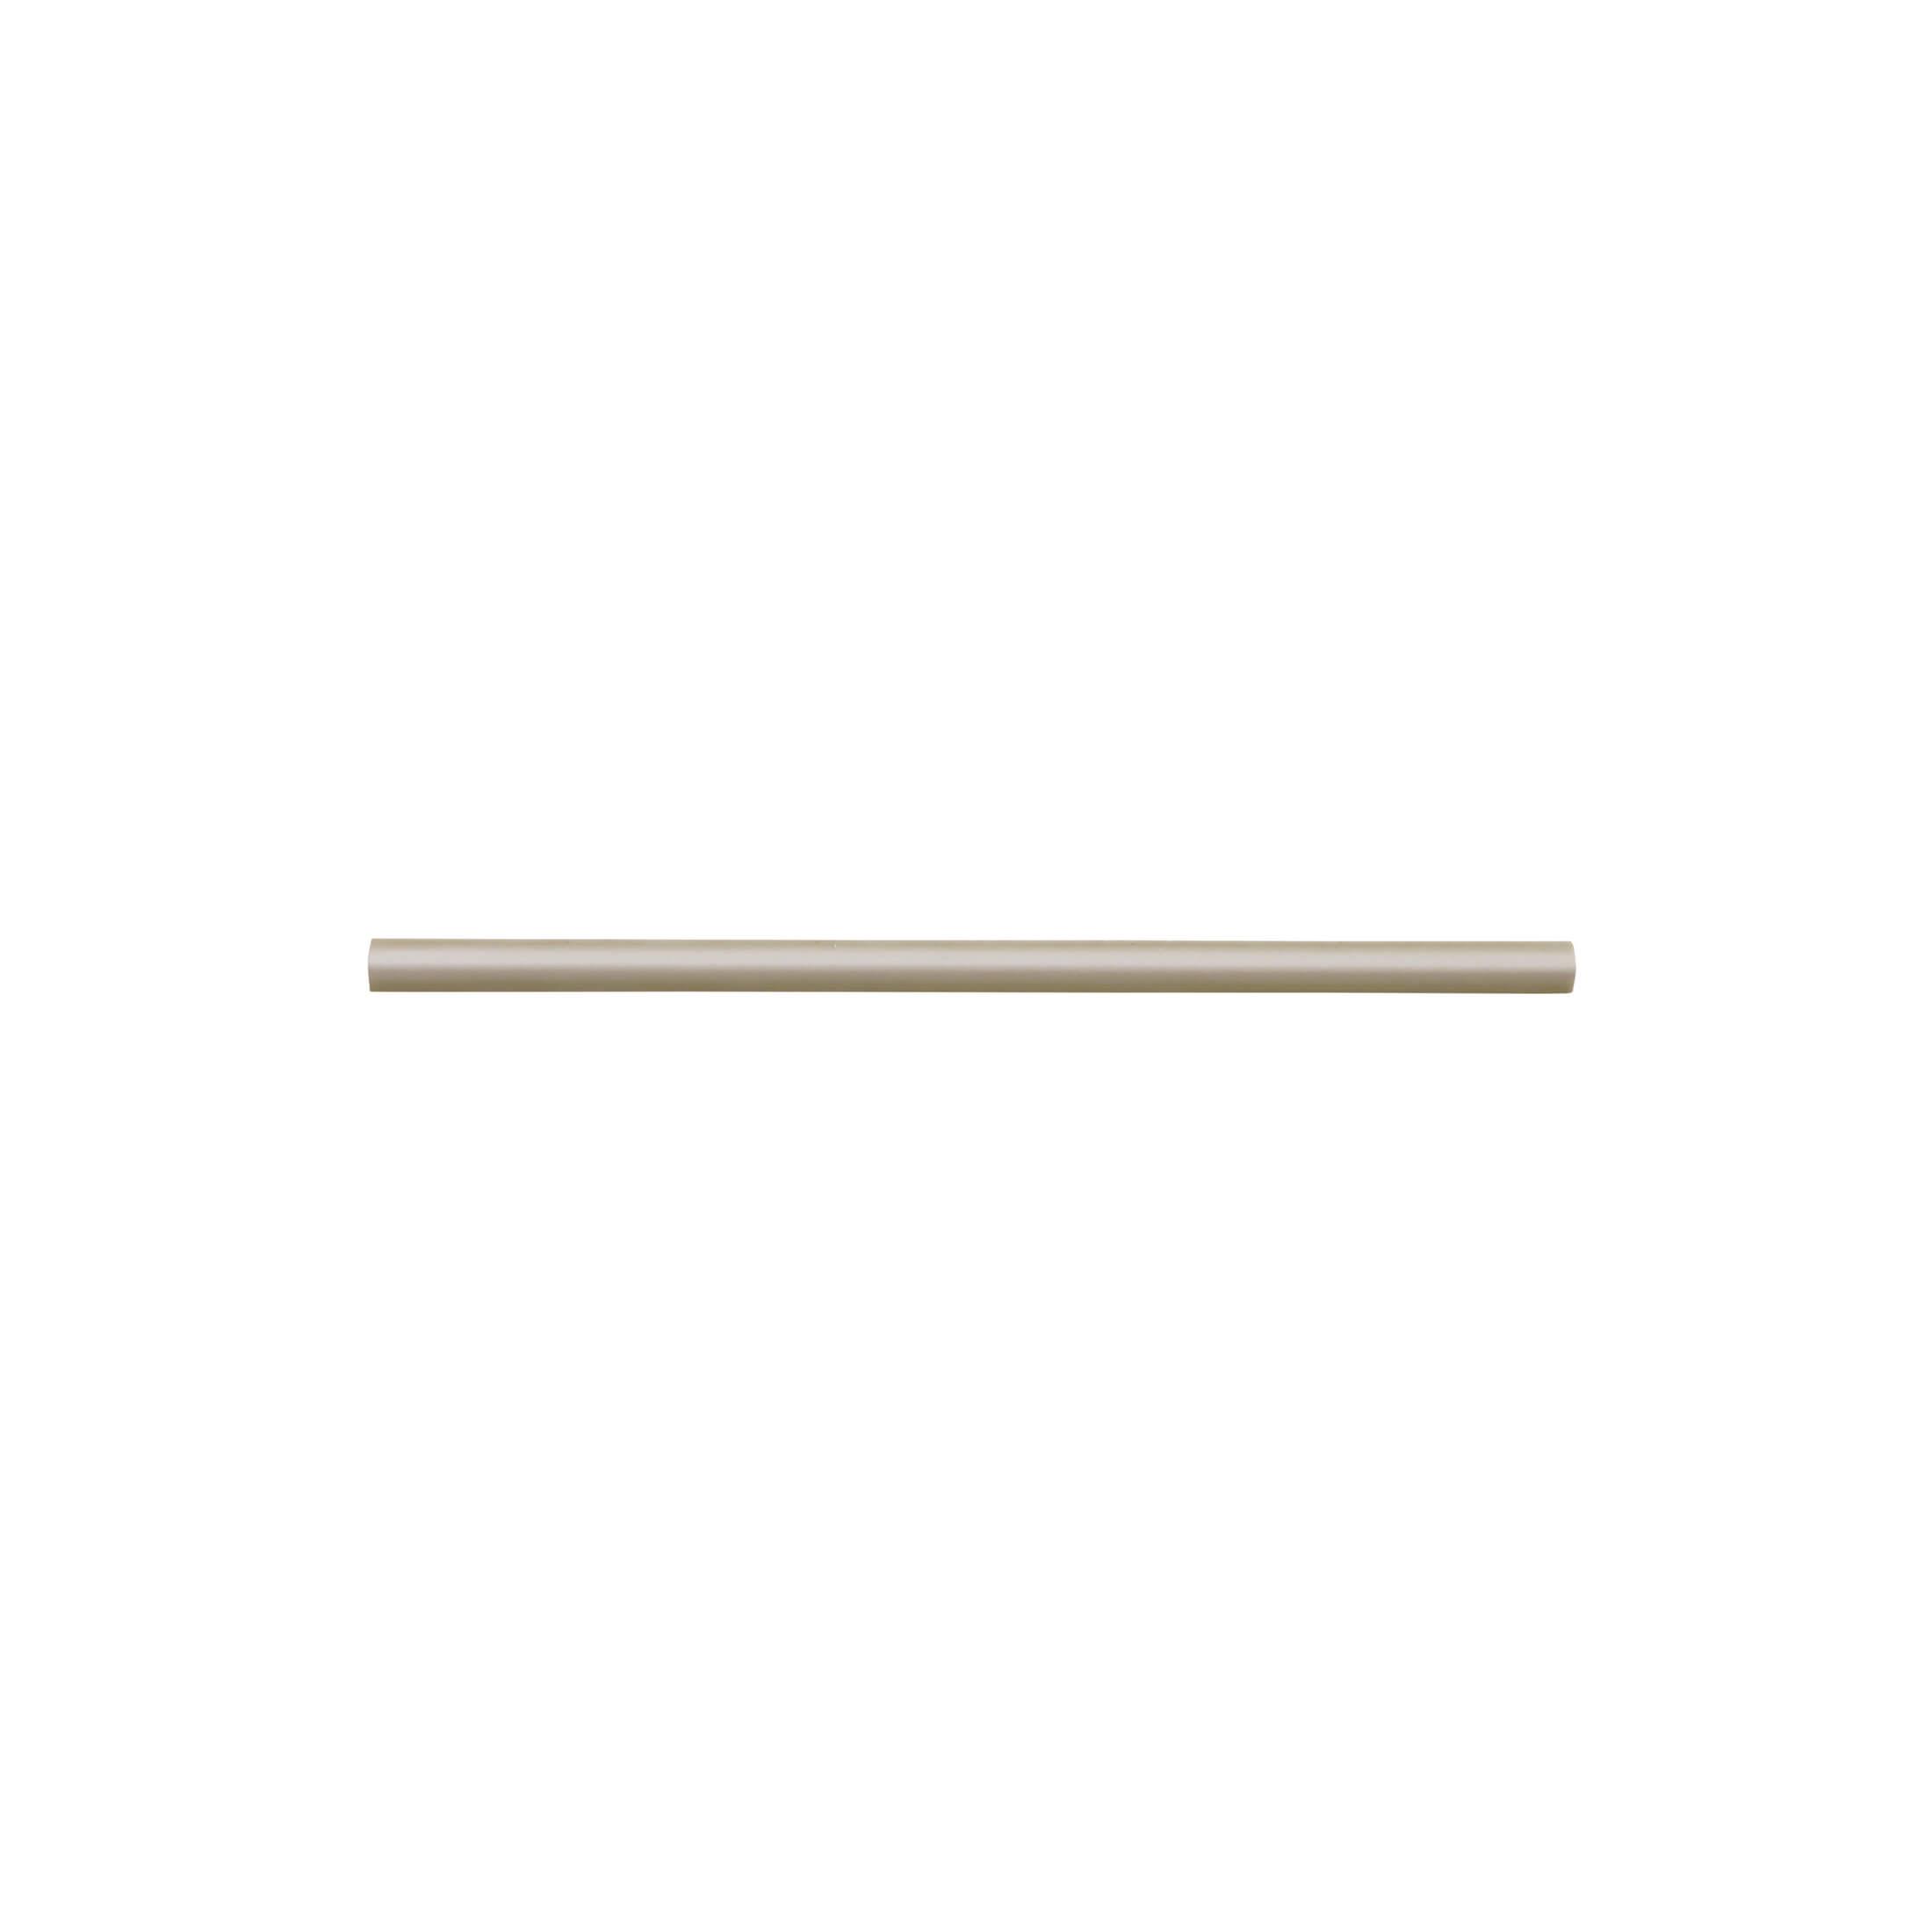 ADNE5583 - BULLNOSE TRIM - 0.85 cm X 20 cm